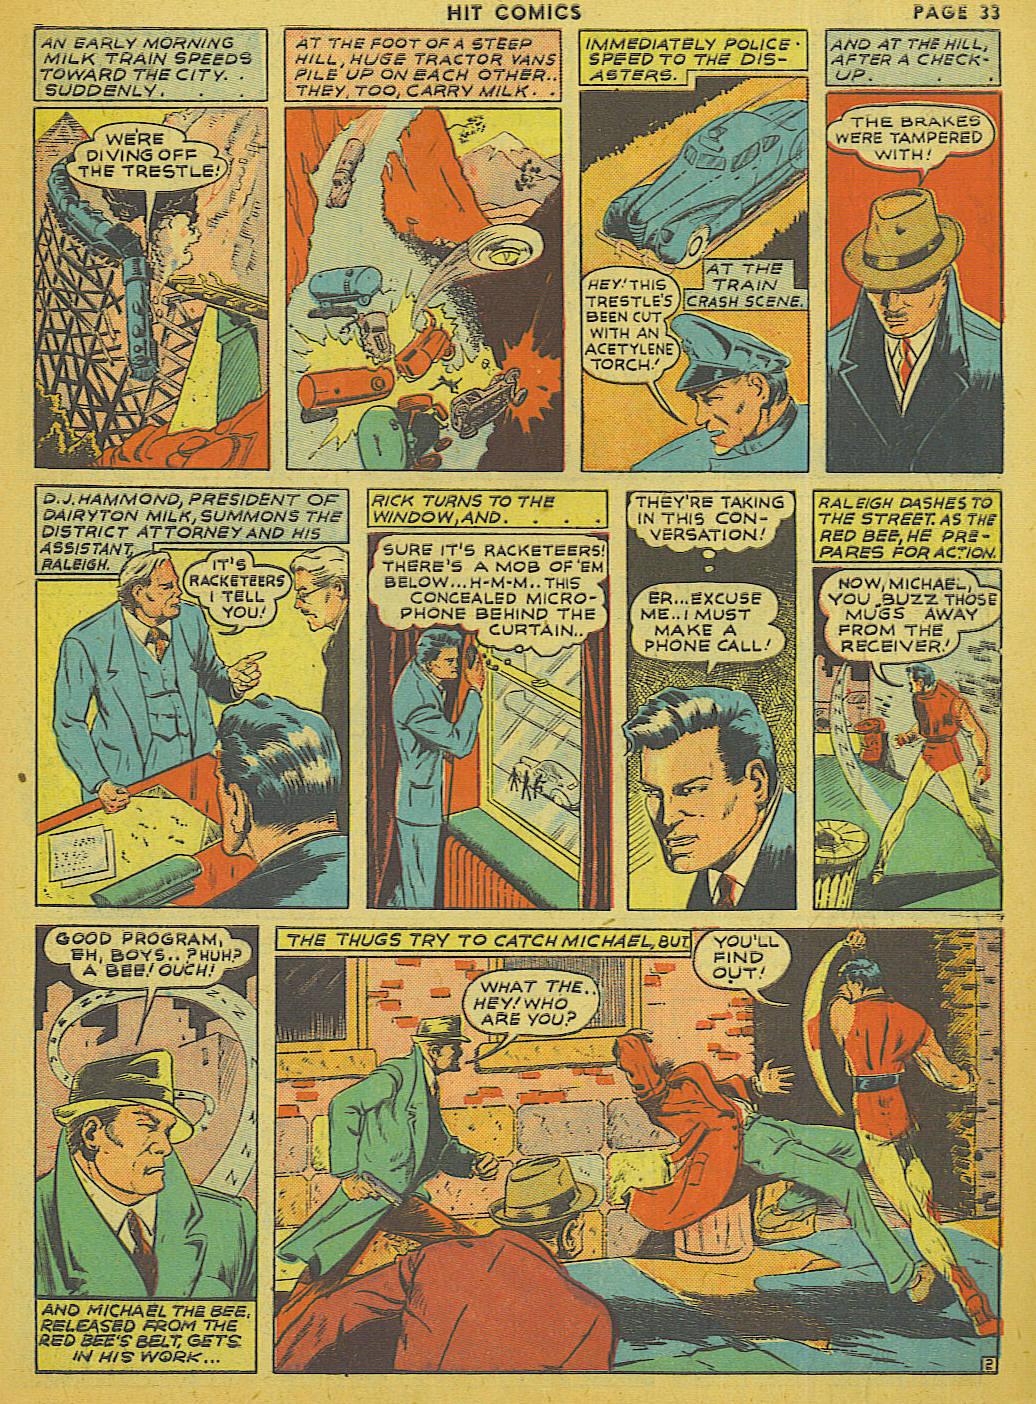 Read online Hit Comics comic -  Issue #13 - 35